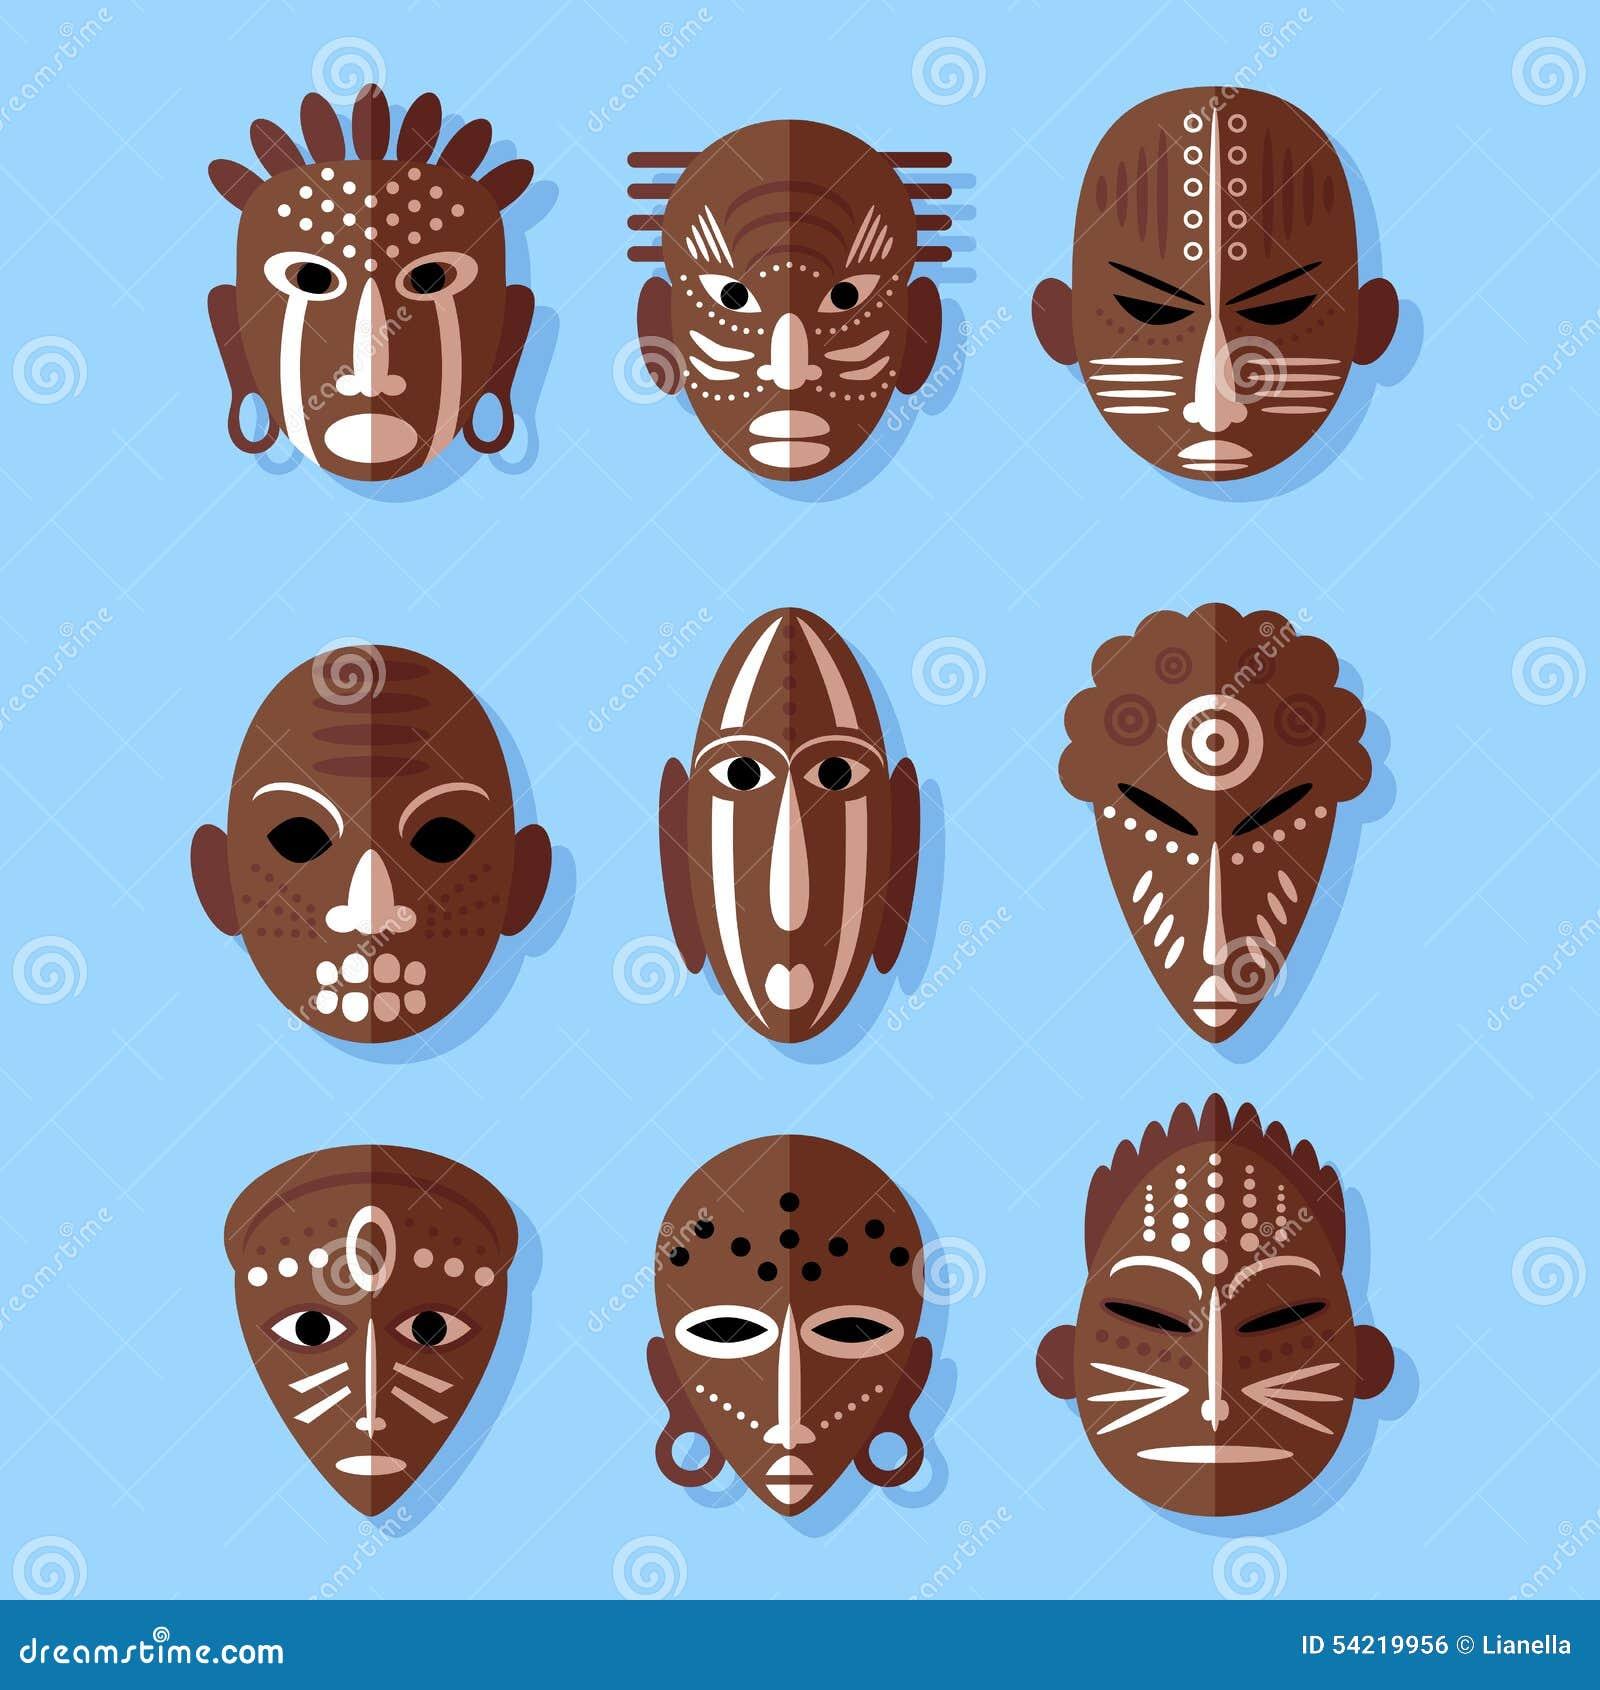 afrikanische masken ikonen vektor abbildung illustration. Black Bedroom Furniture Sets. Home Design Ideas